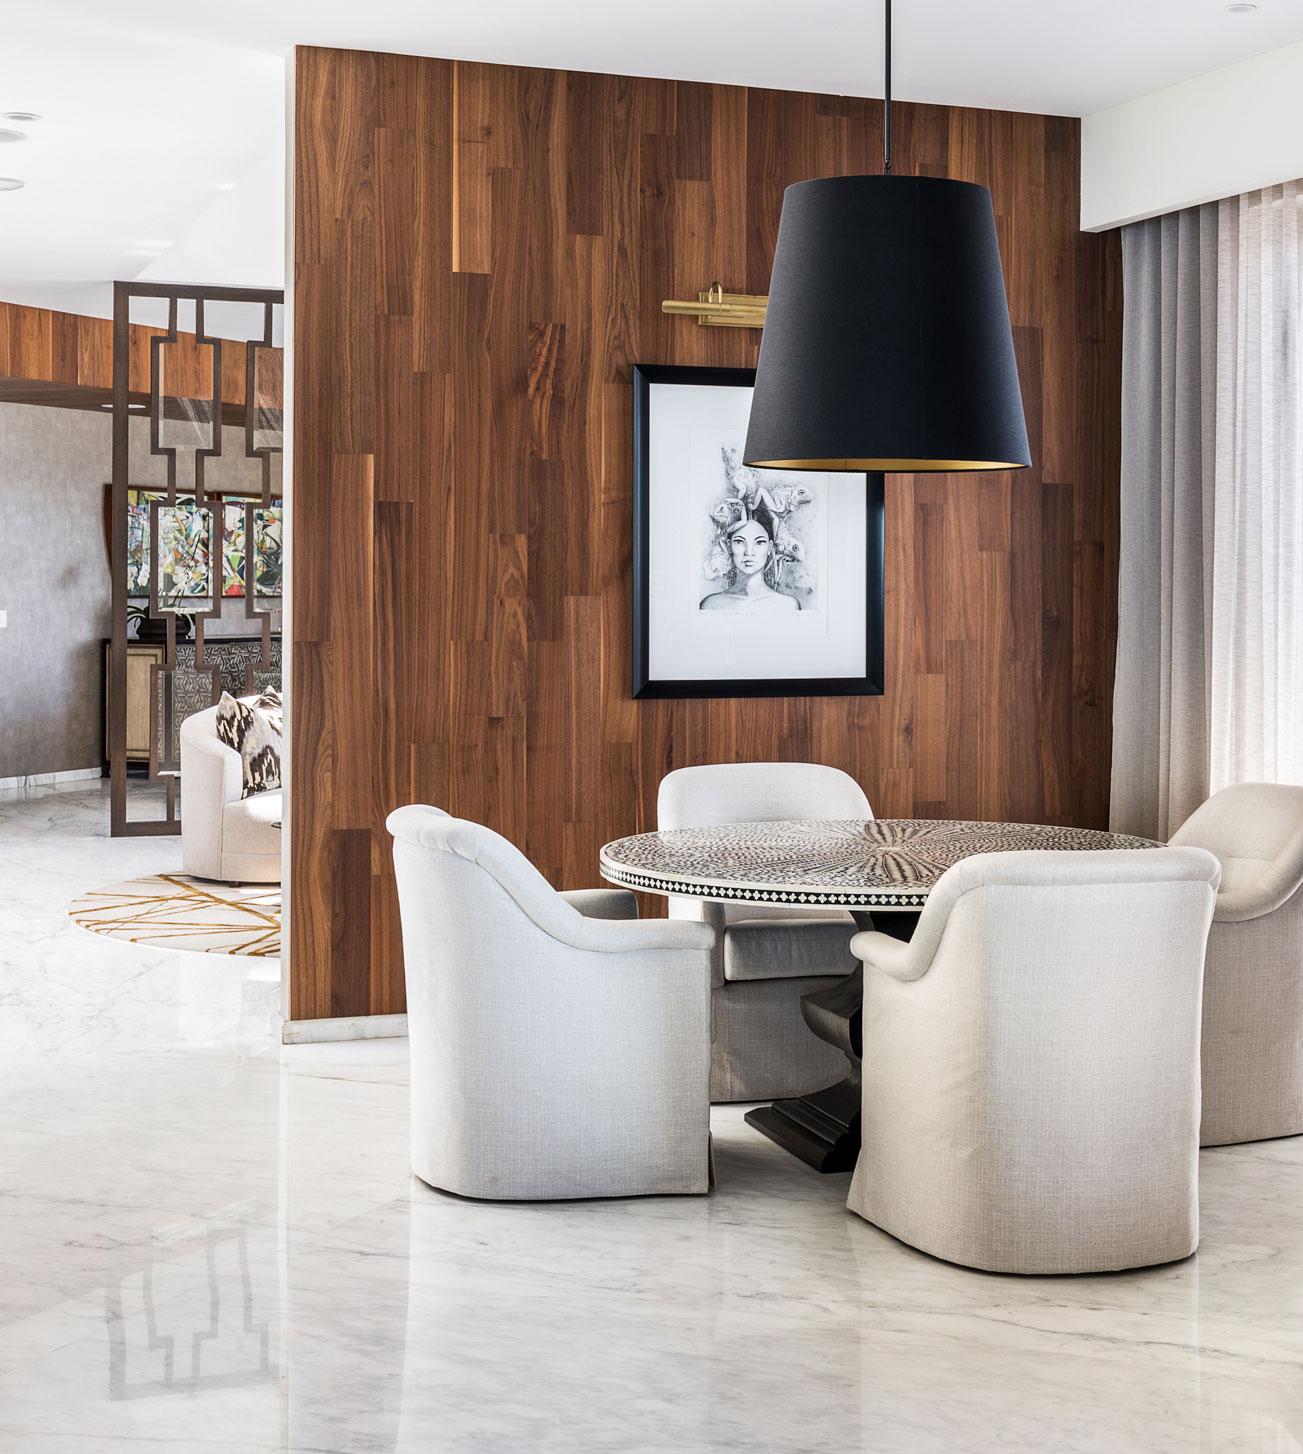 Ordaz Coppel Arquitectos-GH House-2.jpg